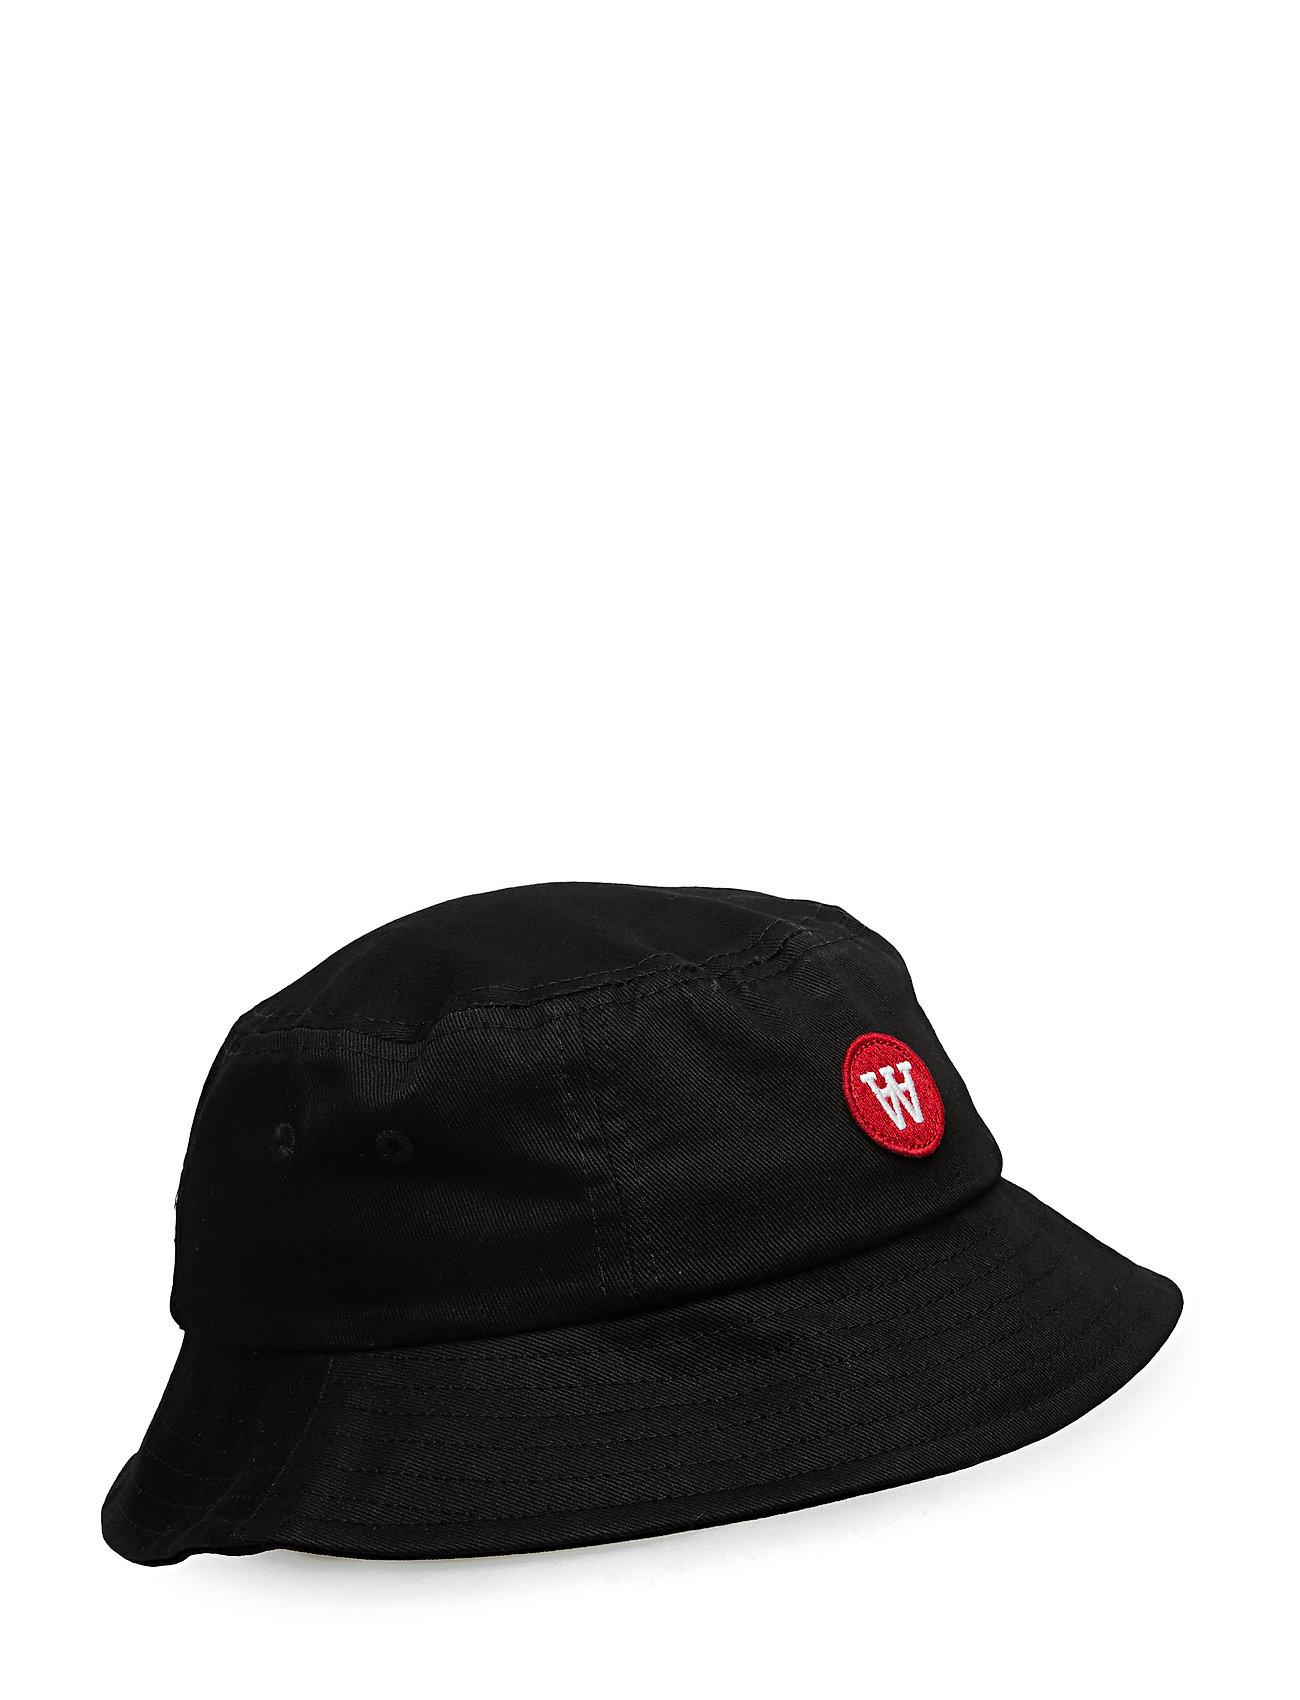 Wood Wood Val kids bucket hat - BLACK